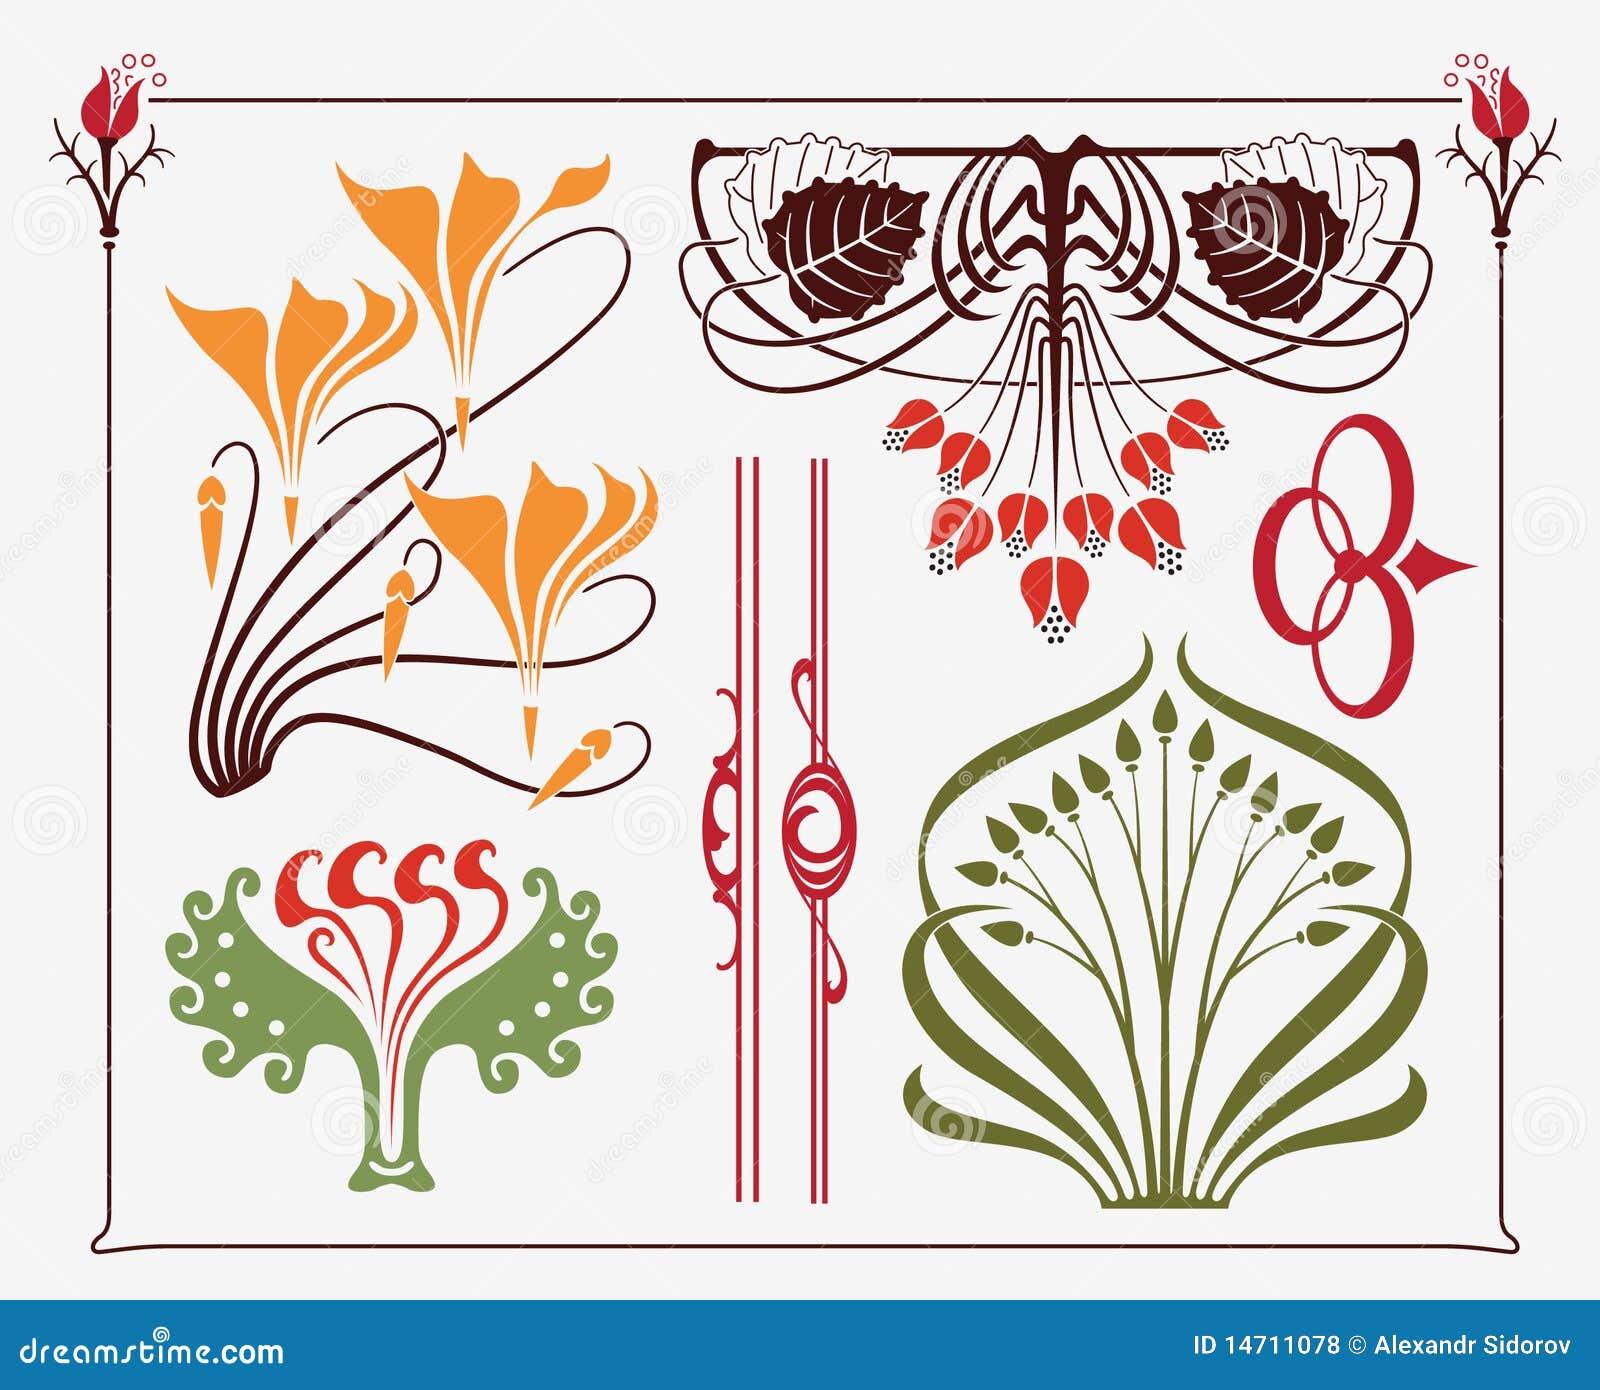 Art Design : Art nouveau design royalty free stock photos image